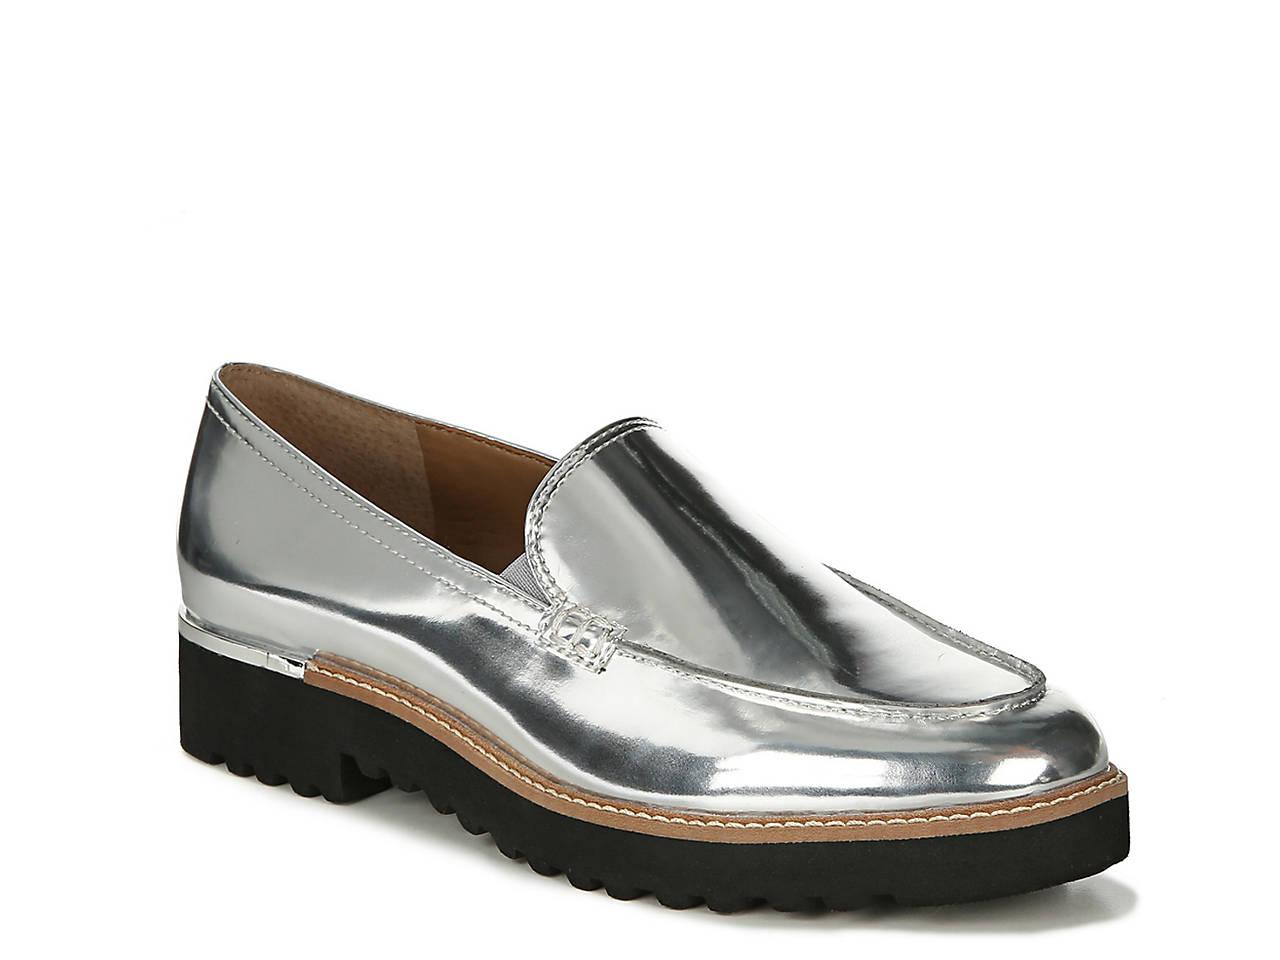 410f4a7049e Franco Sarto Cypress Platform Loafer Women s Shoes